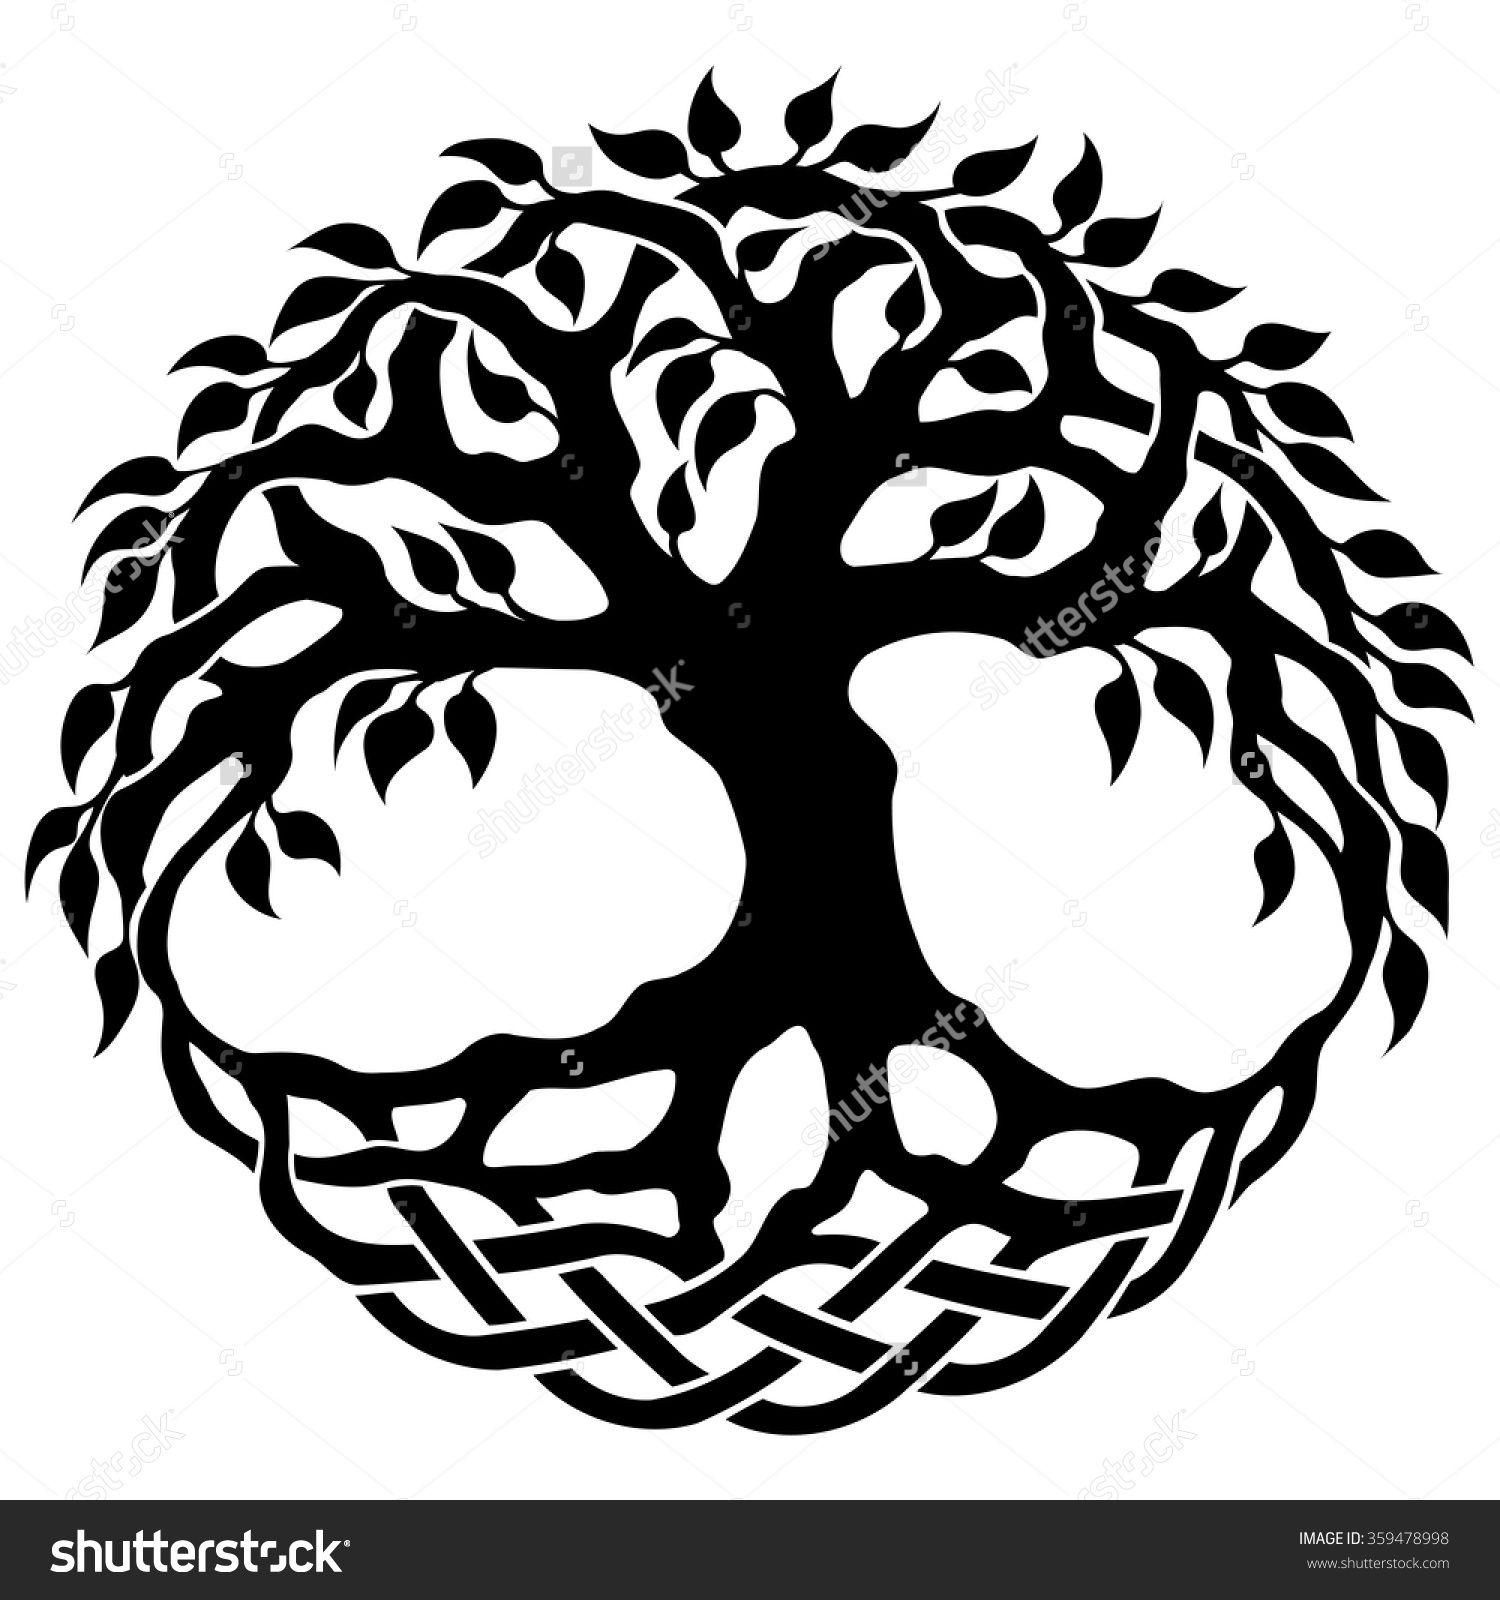 Vector Ornament, Decorative Celtic Tree Of Life.